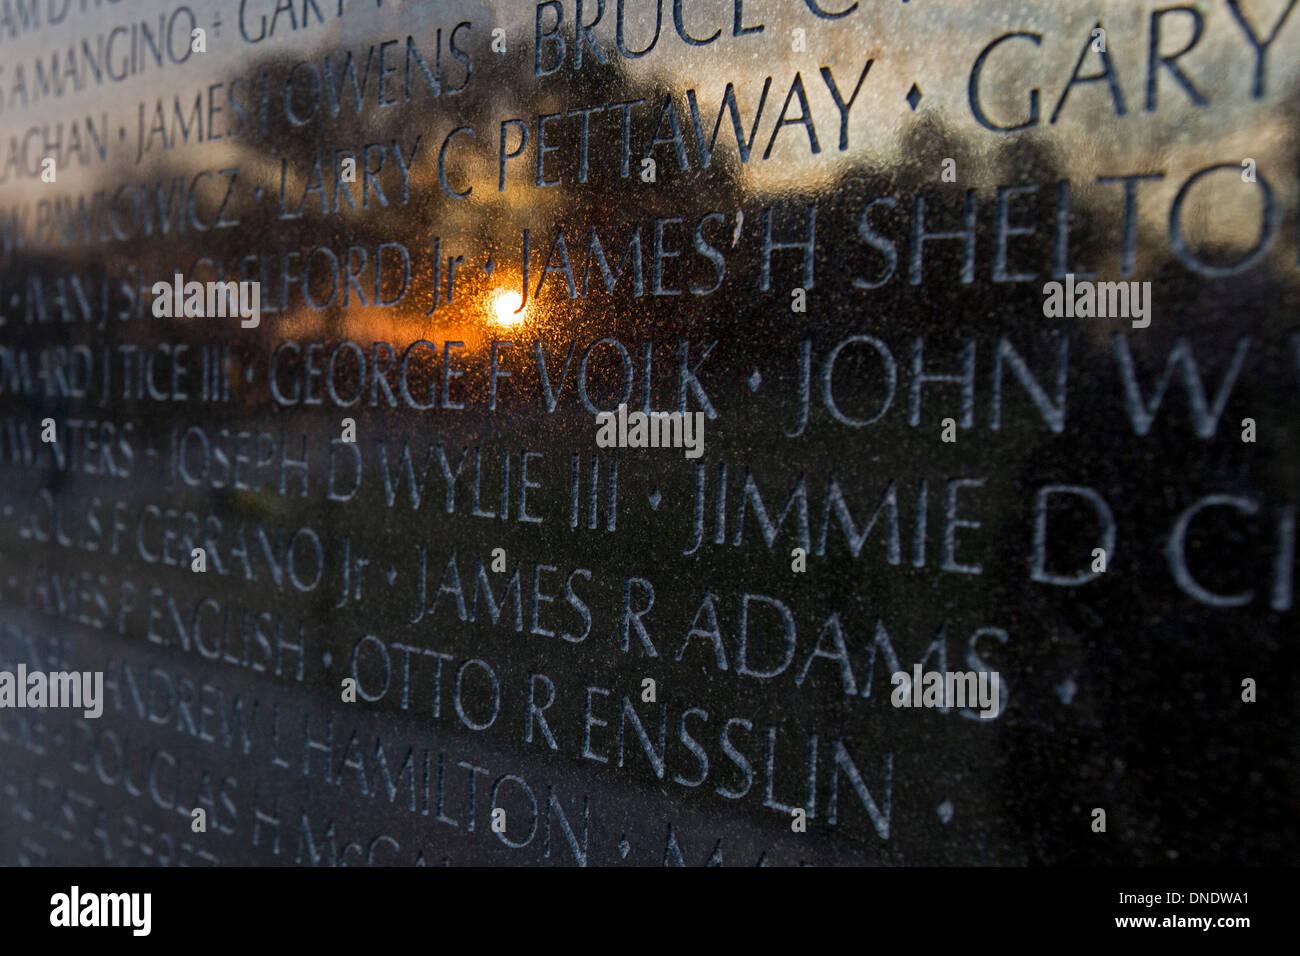 Vietnam Veterans Memorial - Stock Image